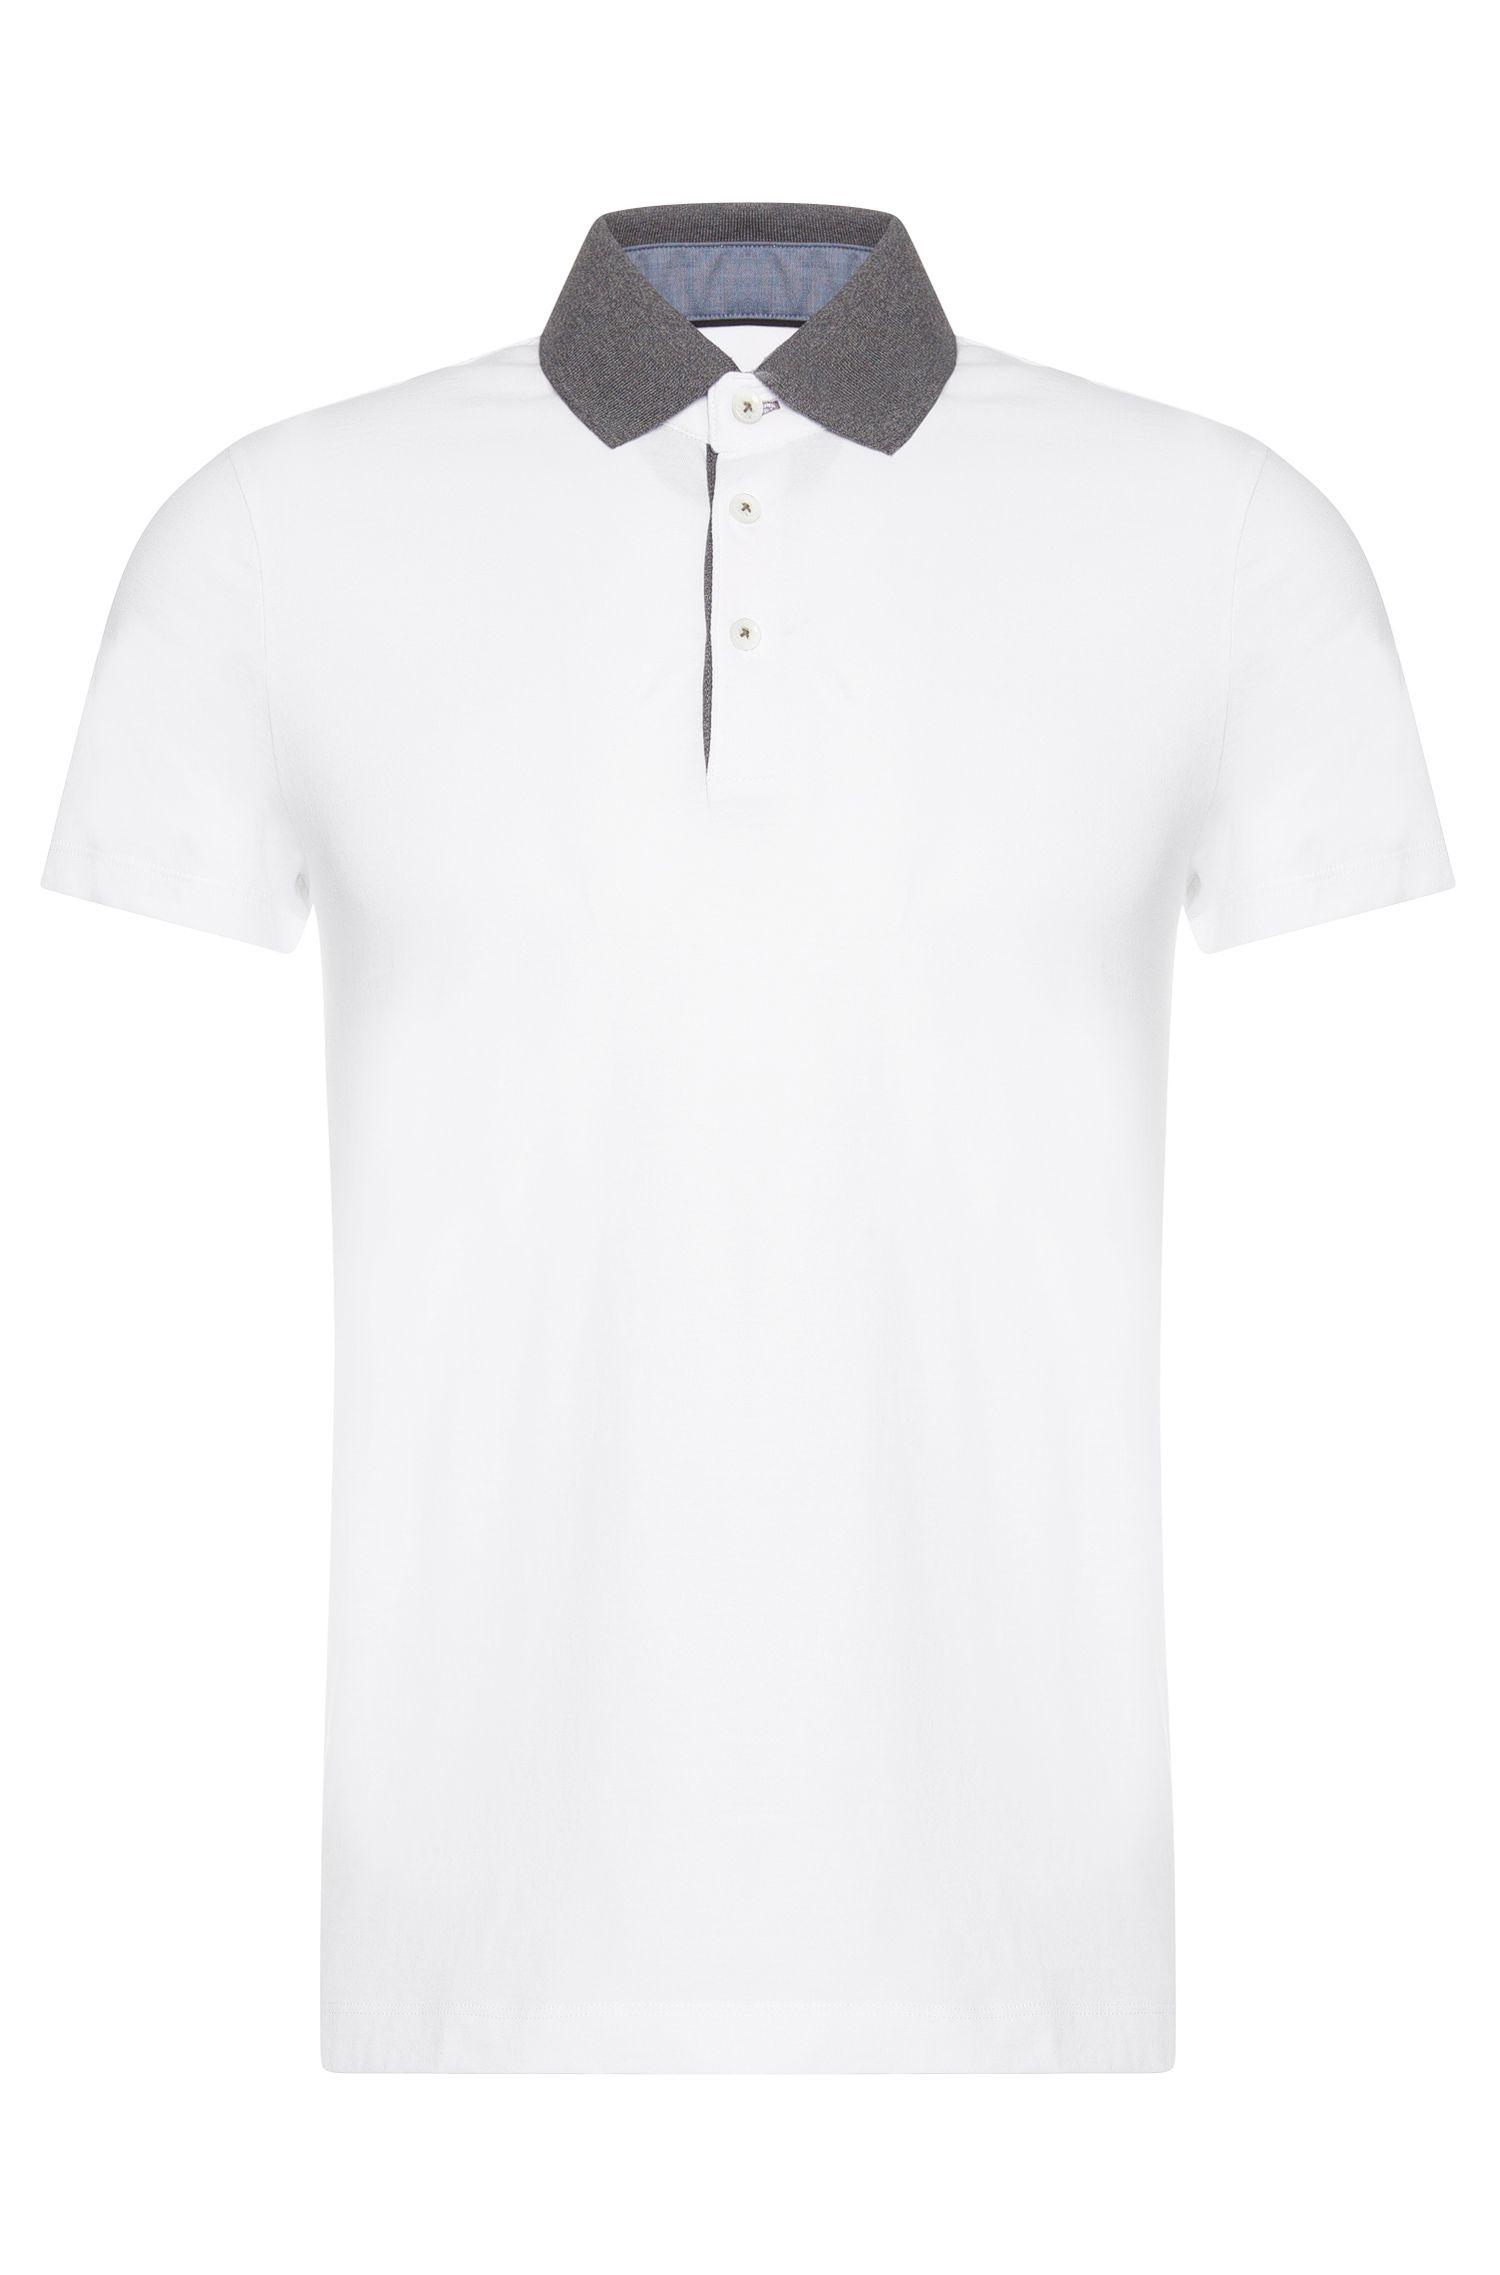 Slim-Fit Poloshirt aus Baumwolle: 'Place 10'